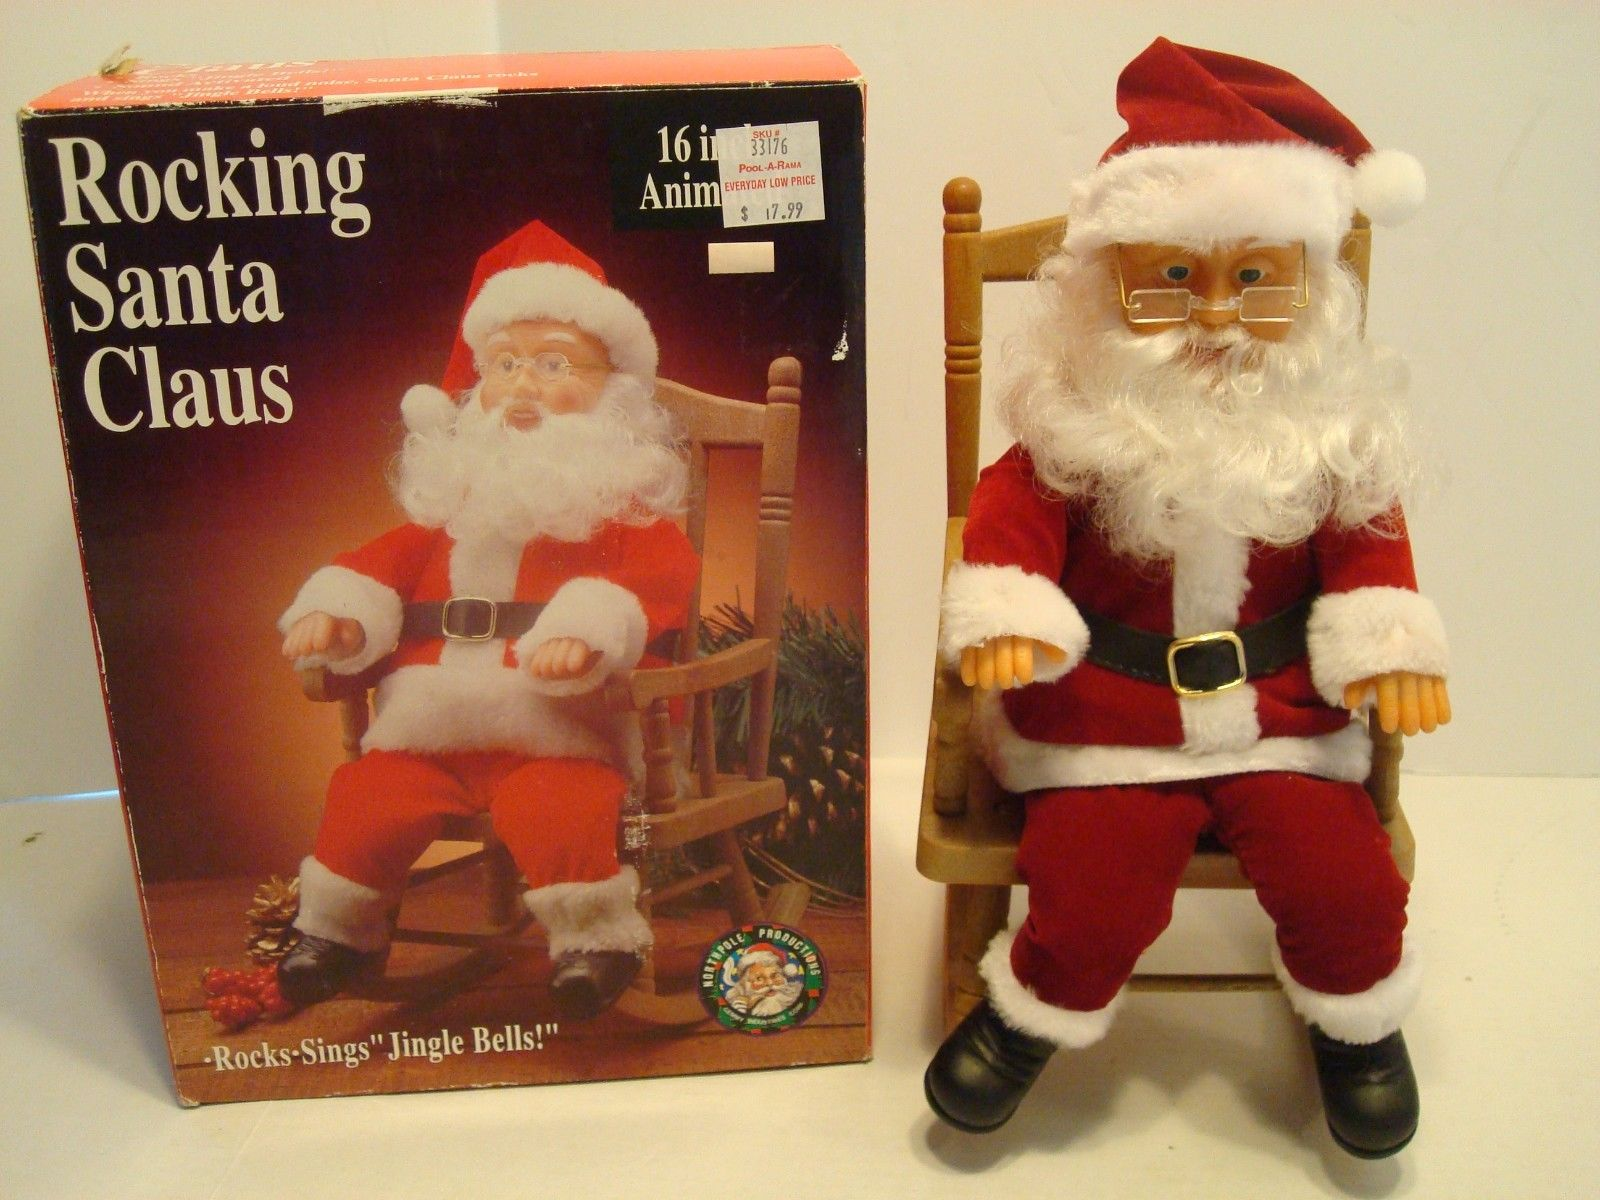 Rocking chair santa gemmy wiki fandom powered by wikia for Animated santa claus decoration